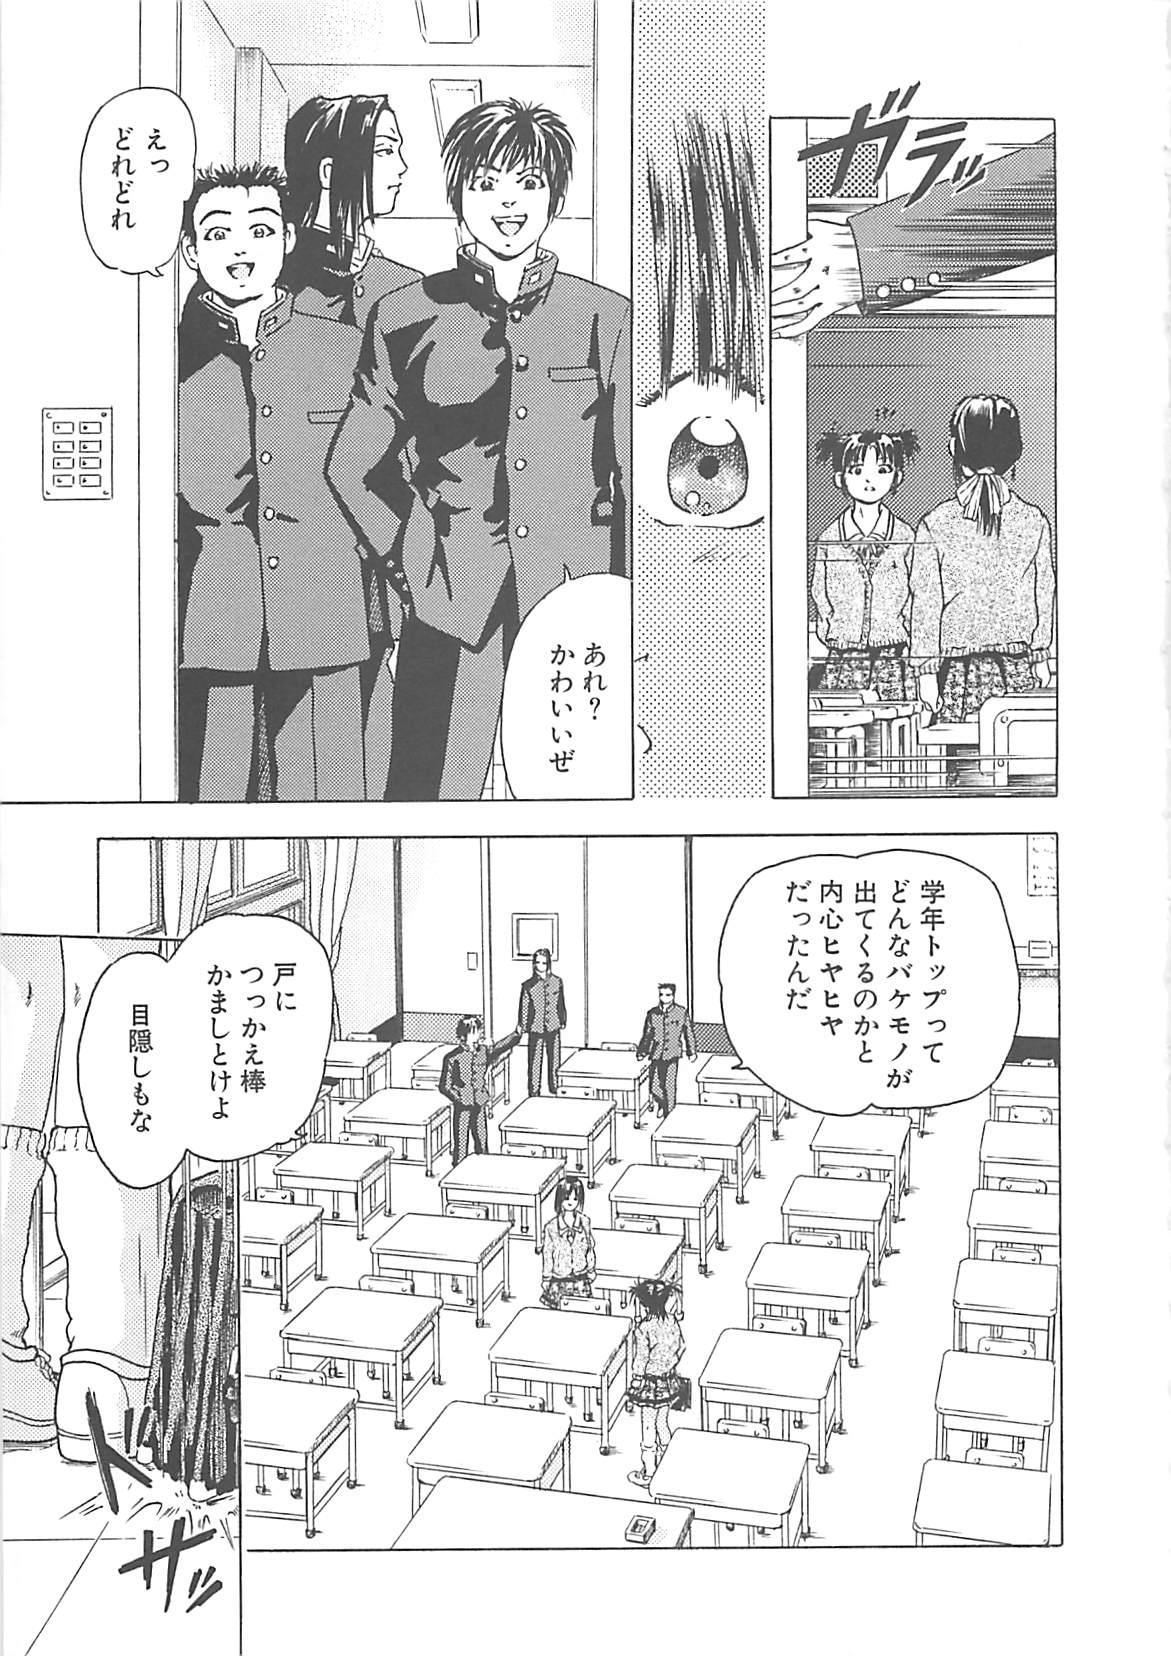 Kanin Kyoushitsu - Adultery Classroom 101